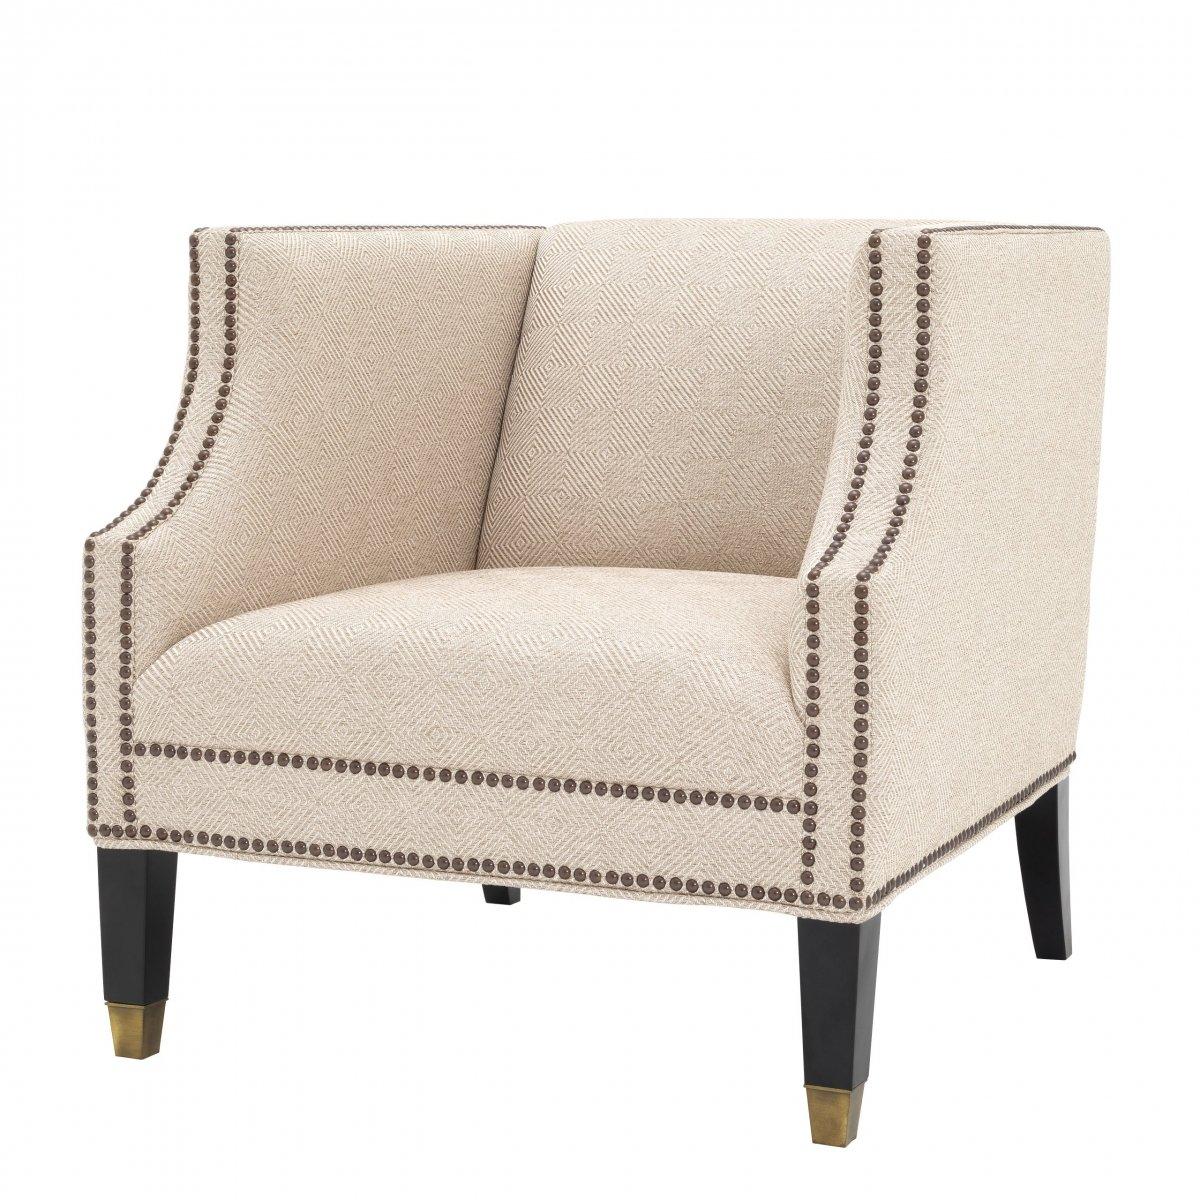 Кресло Eichholtz Chair Doheny  - фото 1